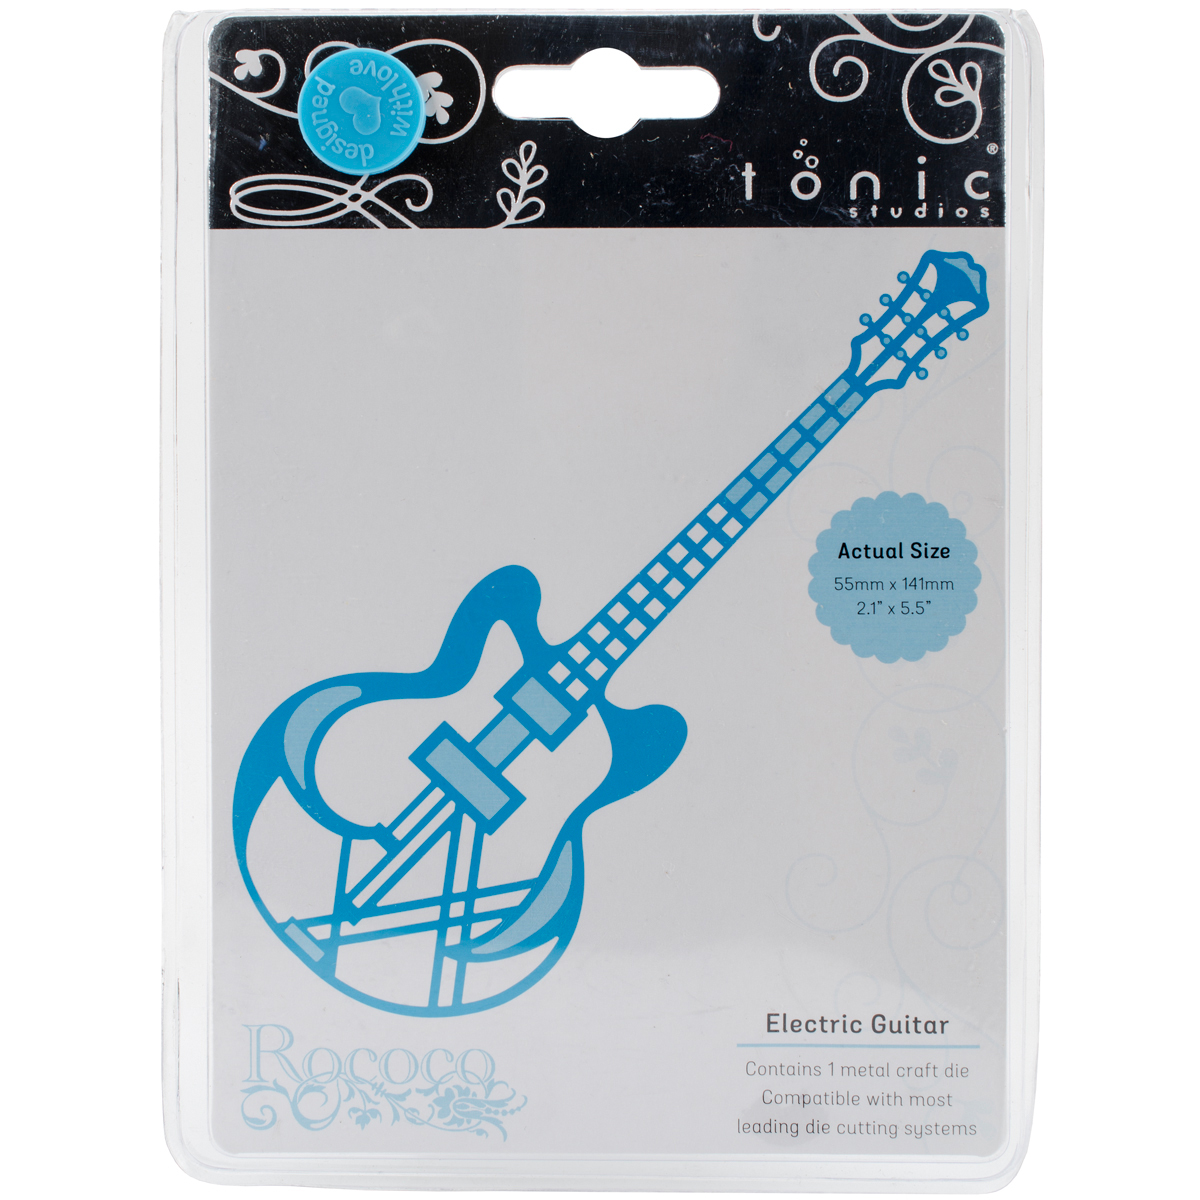 Tonic Studios Rococo Die-Electric Guitar